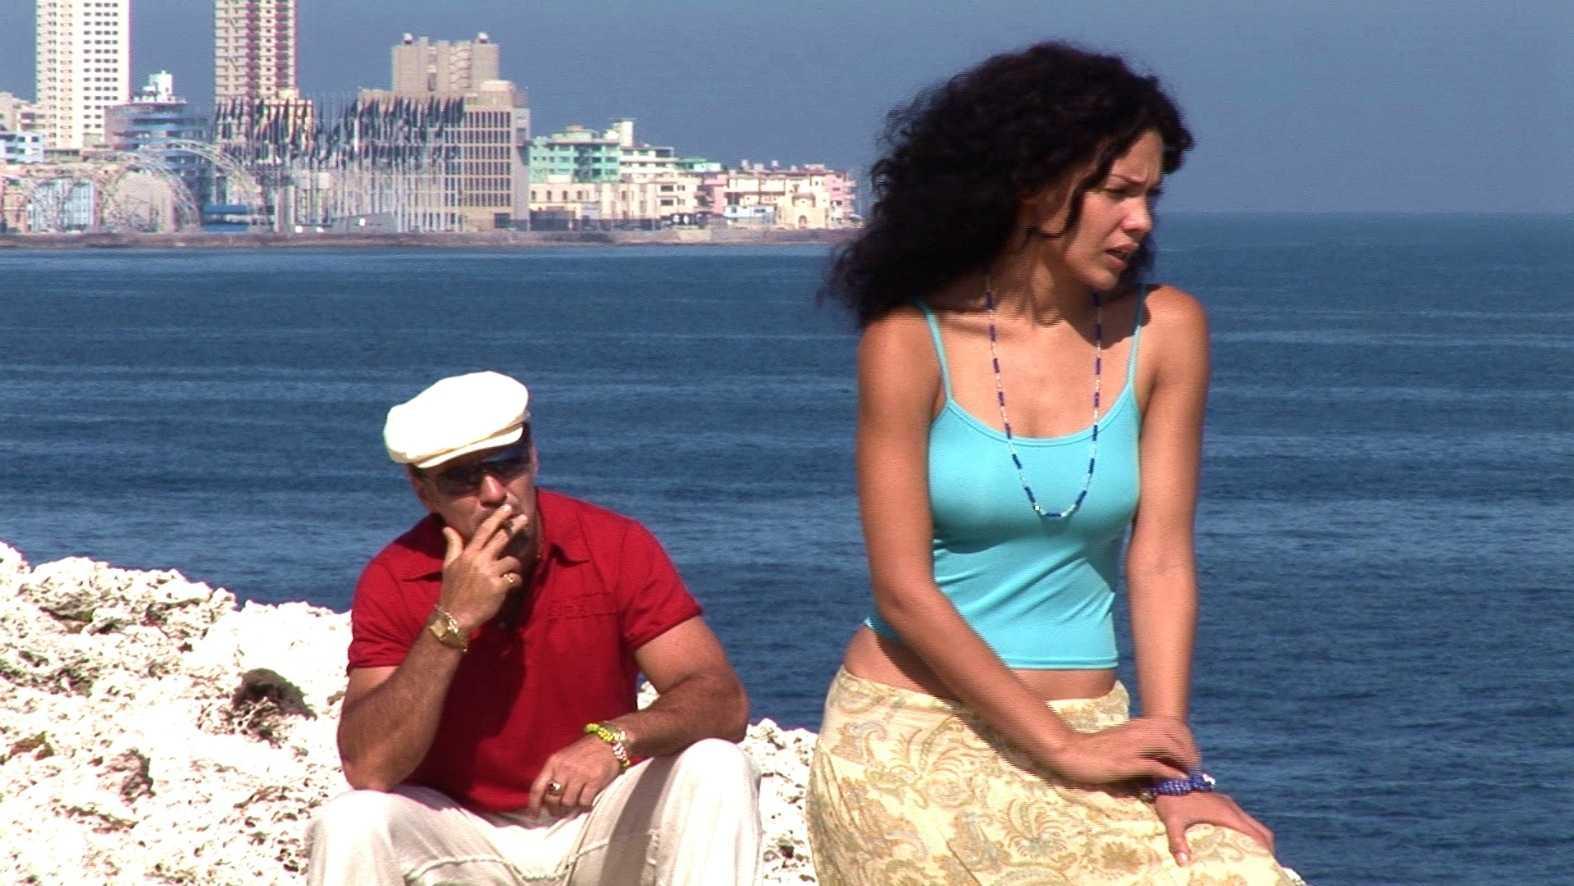 Película cubana completa: Los Dioses Rotos